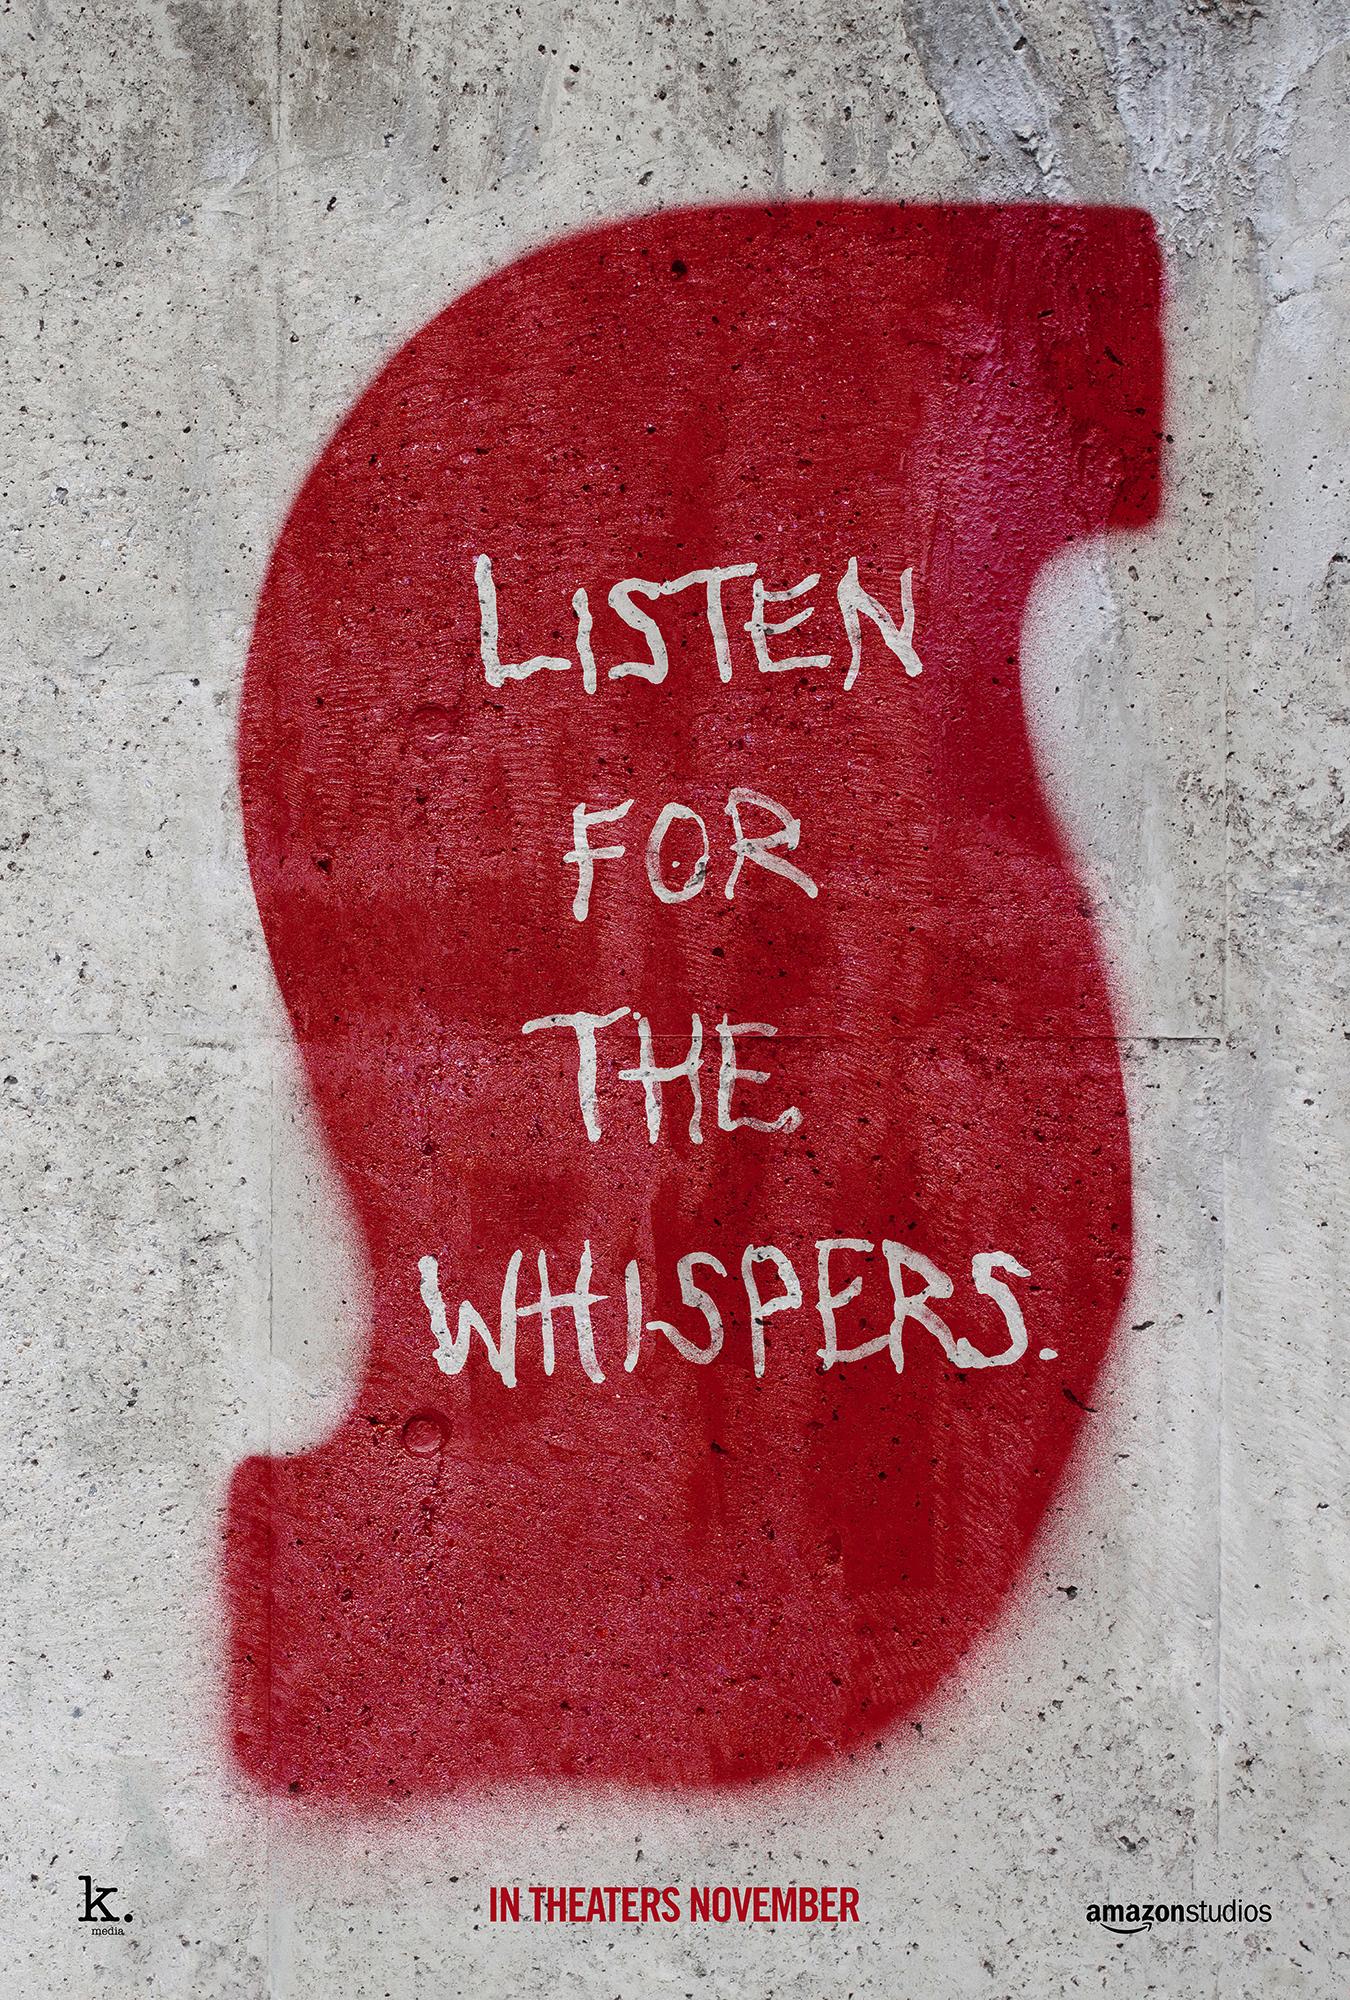 Suspiria_Online_1Sht_Whispers_100dpi.jpg